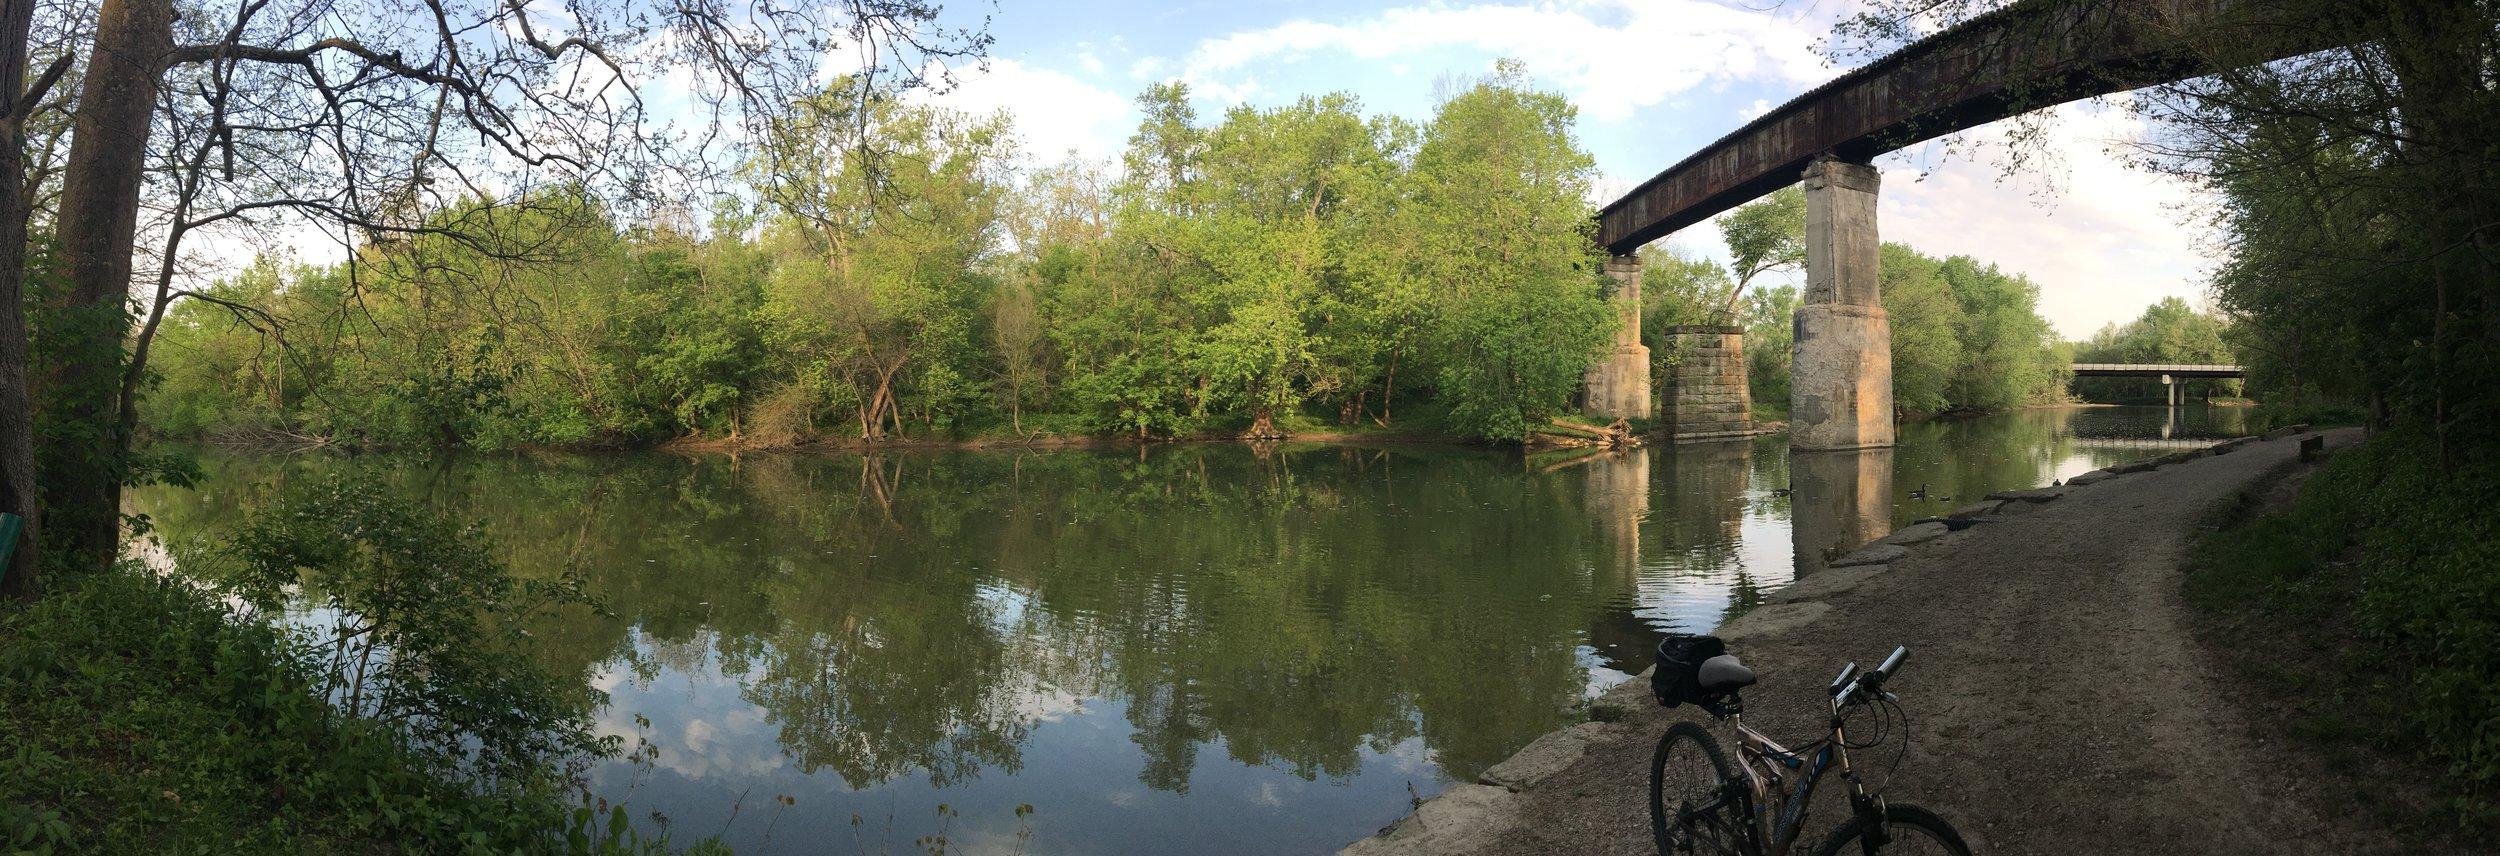 Batelle-Darby Creek Metro Park - Home of the 2016 Central Ohio Folk Festival